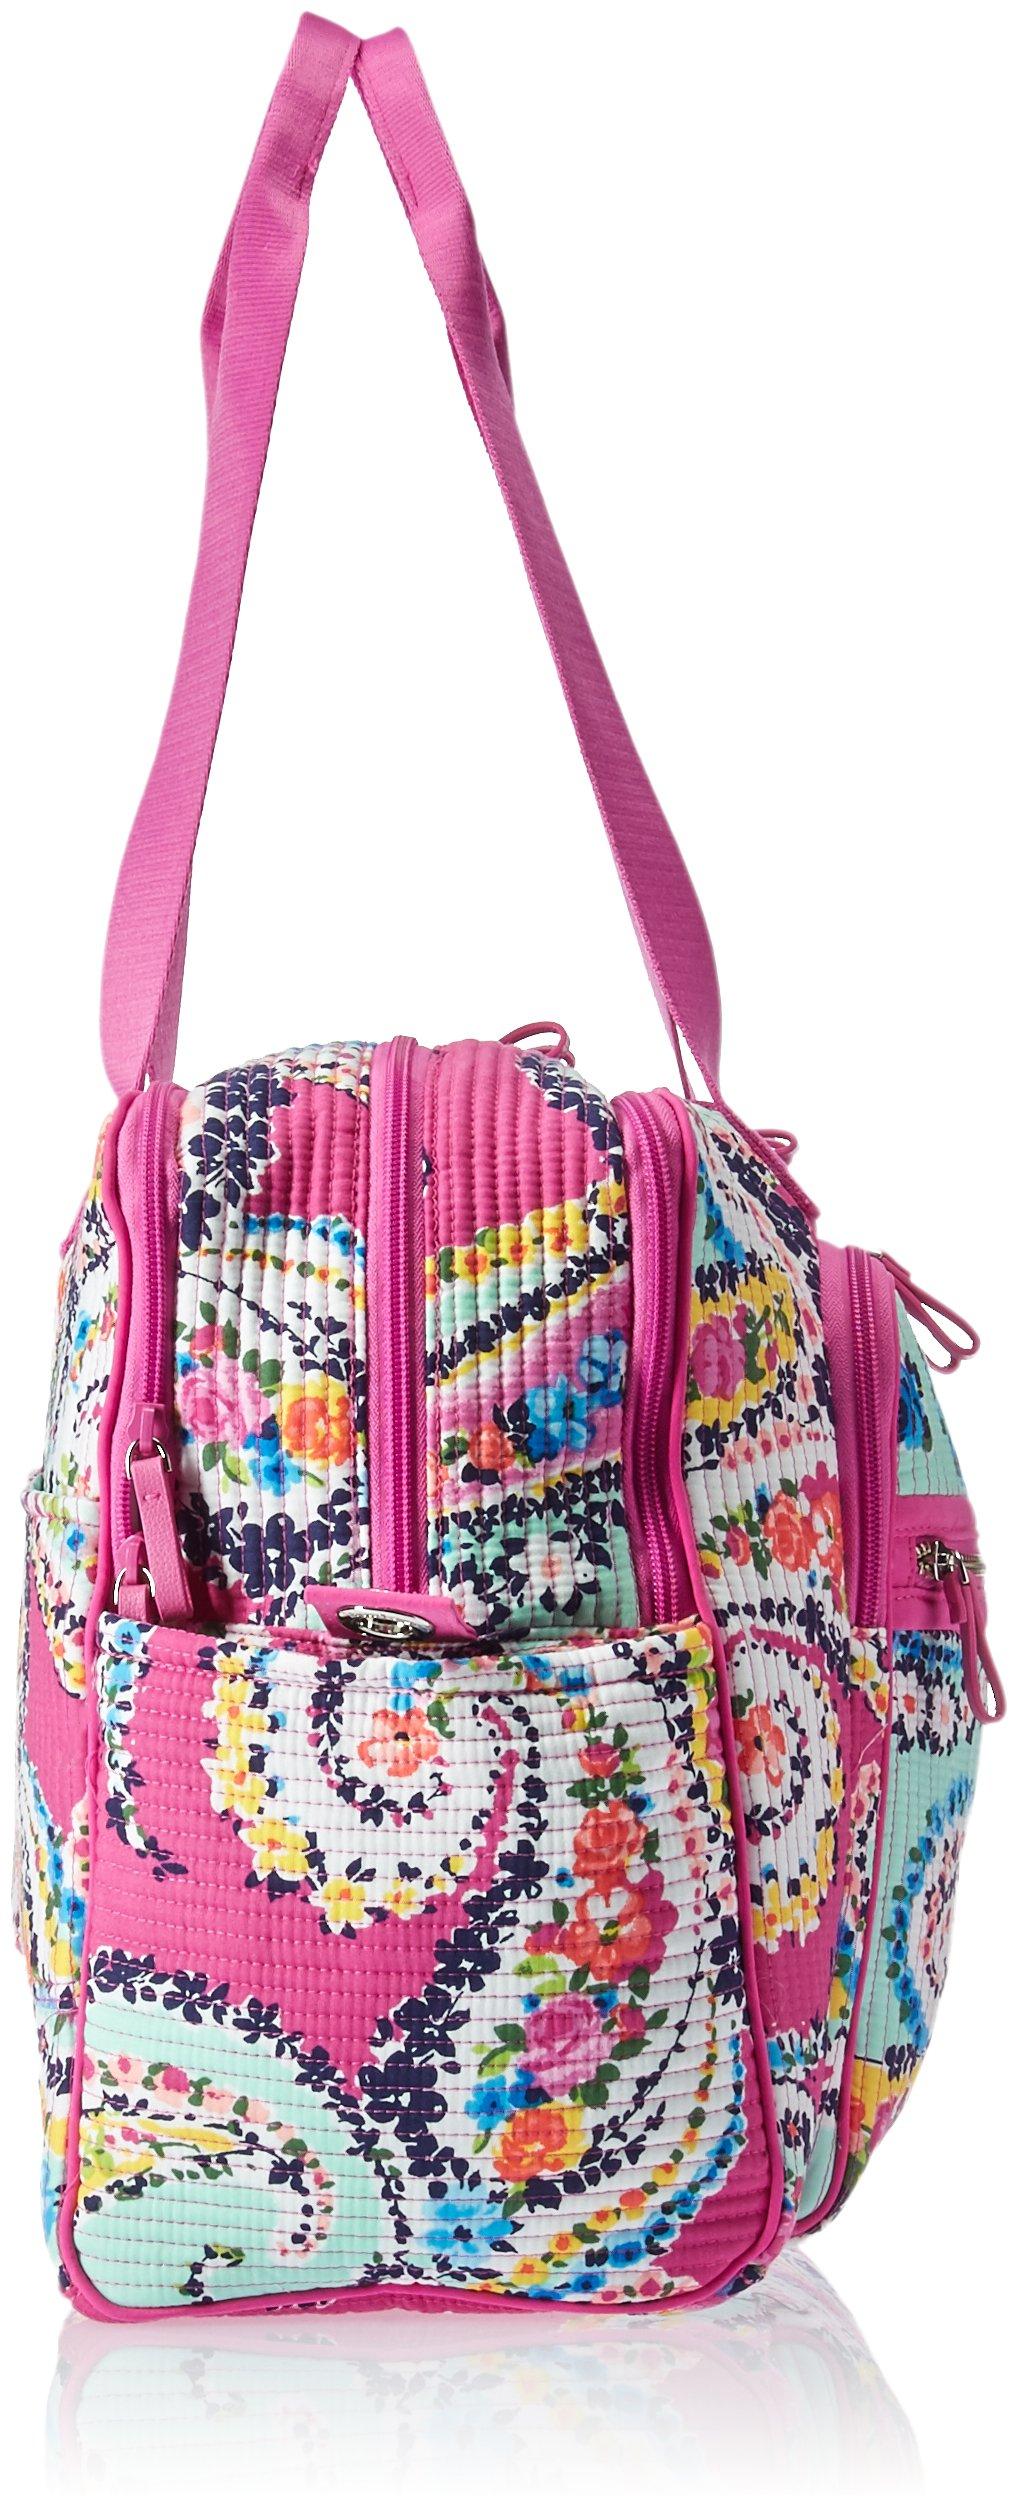 Vera Bradley Iconic Deluxe Weekender Travel Bag, Signature Cotton by Vera Bradley (Image #3)